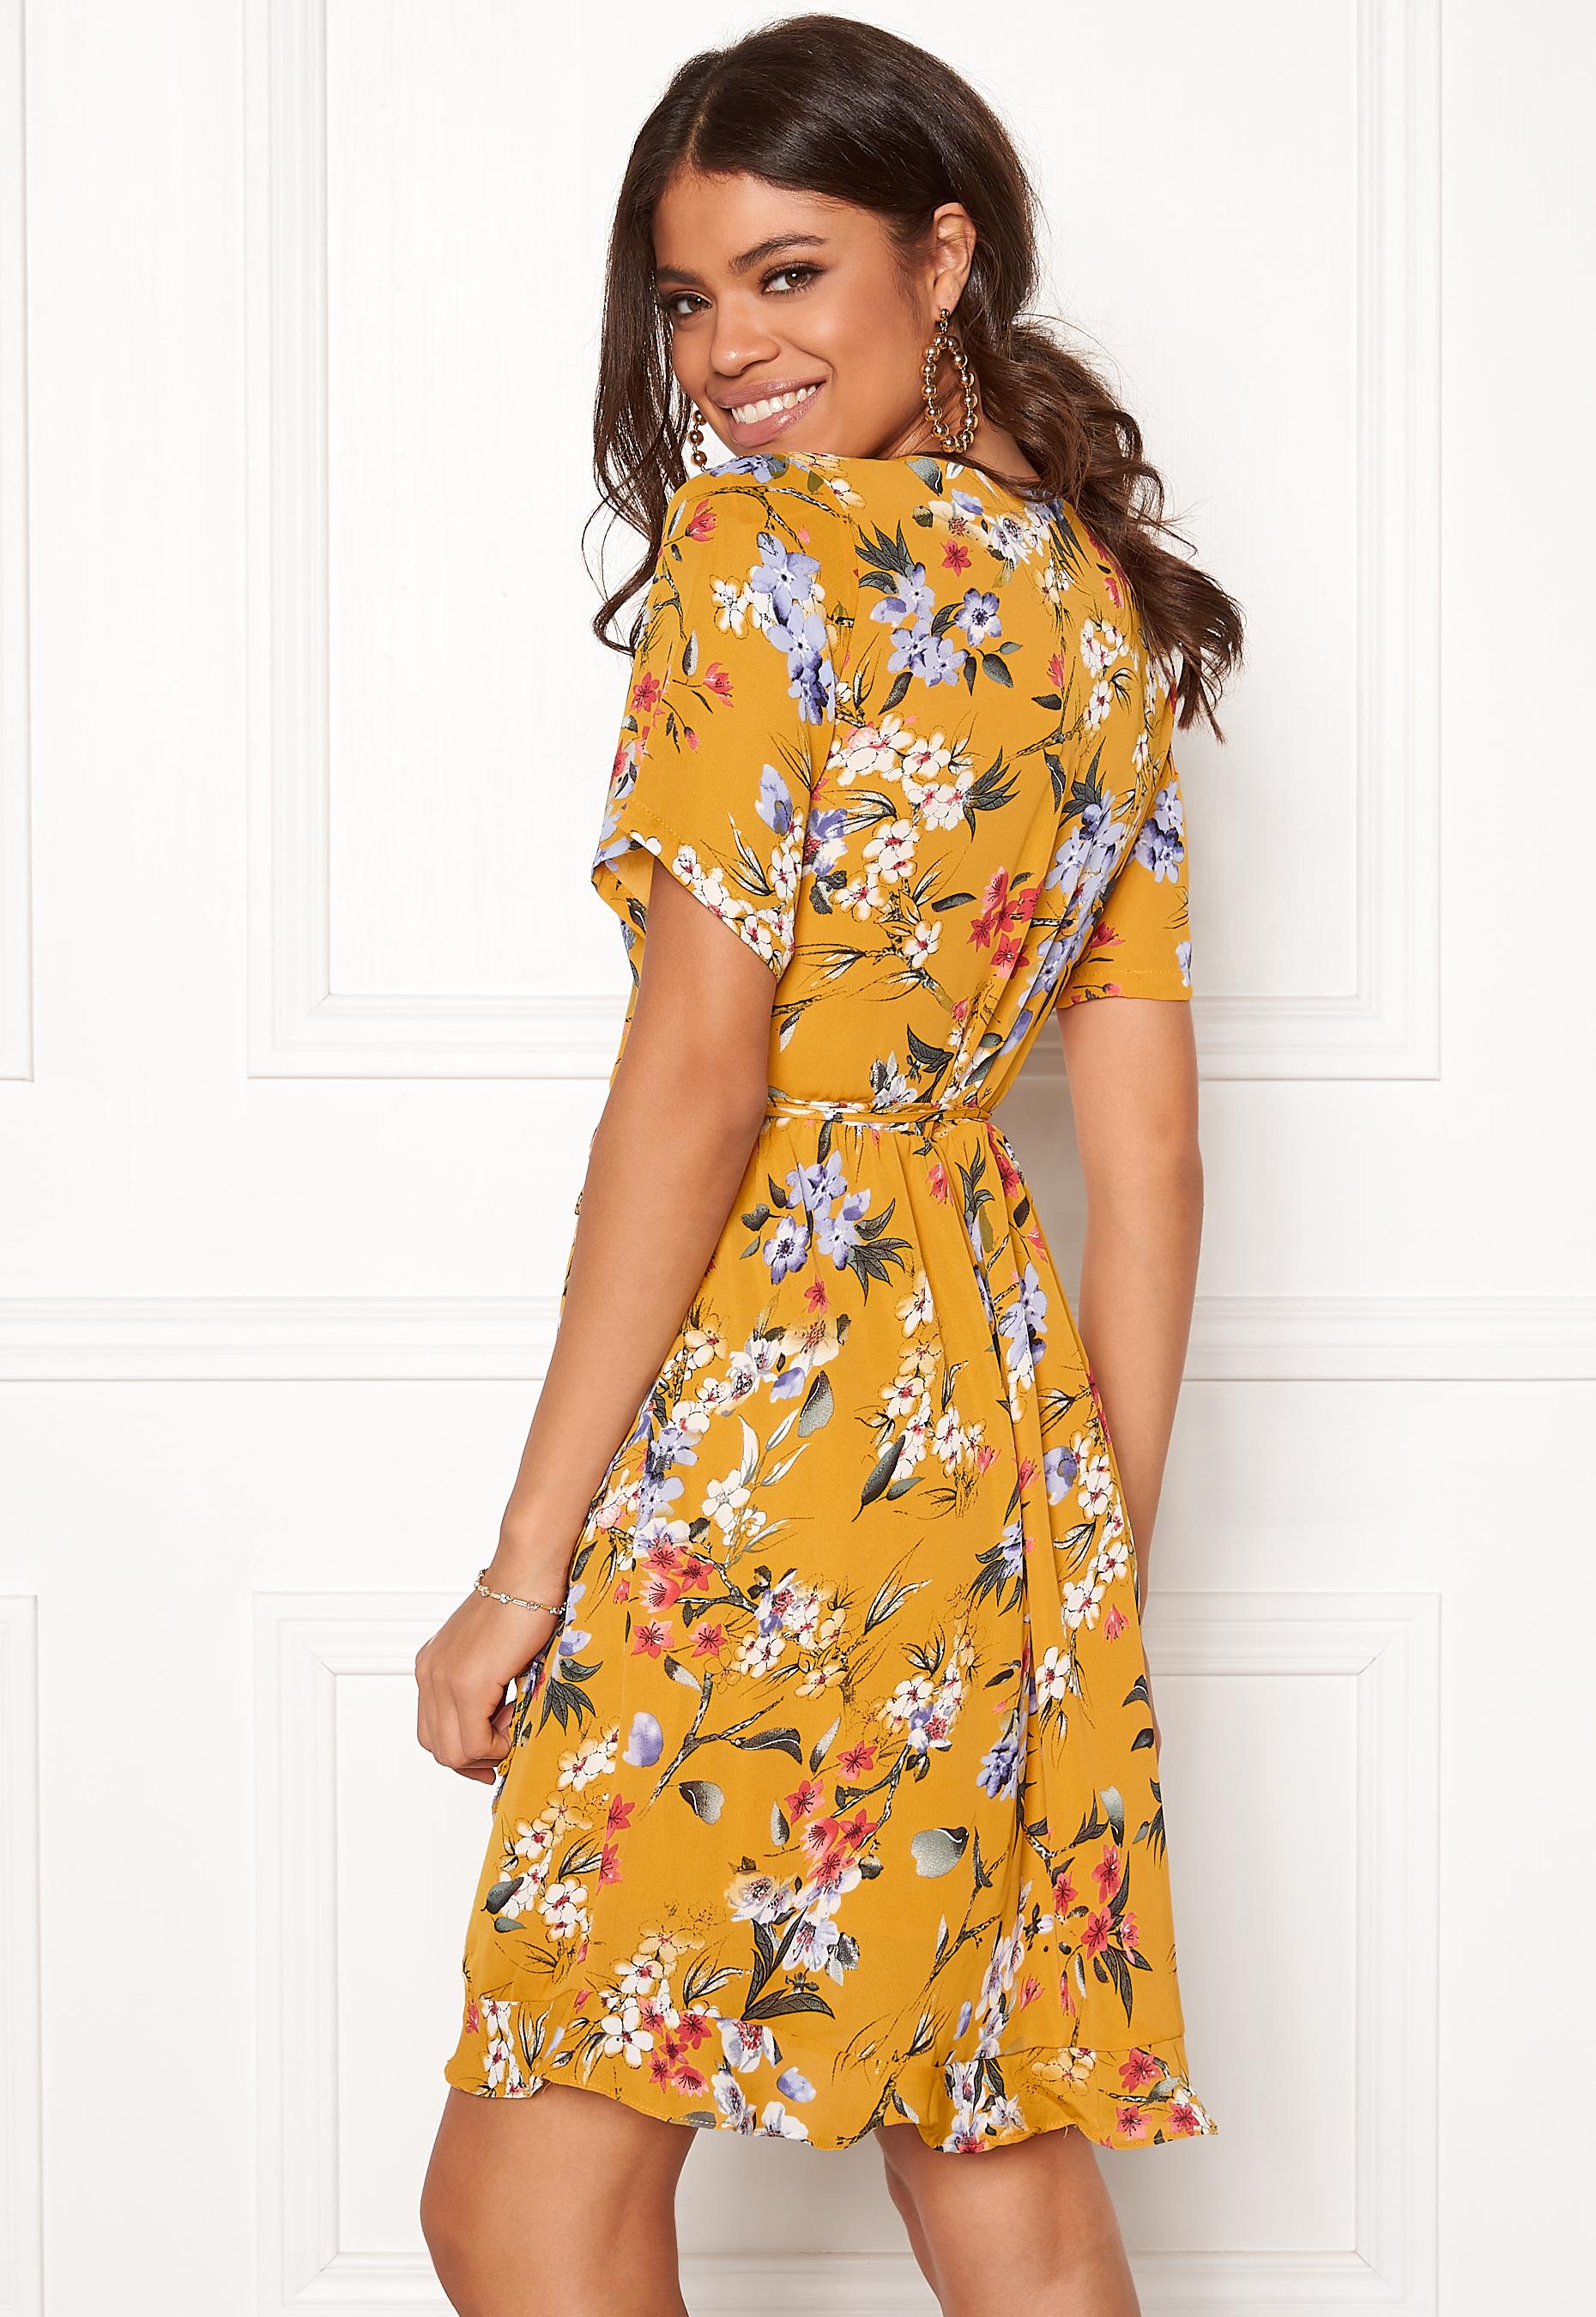 Rut   Circle Eleonor Wrap Dress Yellow Flower - Bubbleroom 67455d7dff